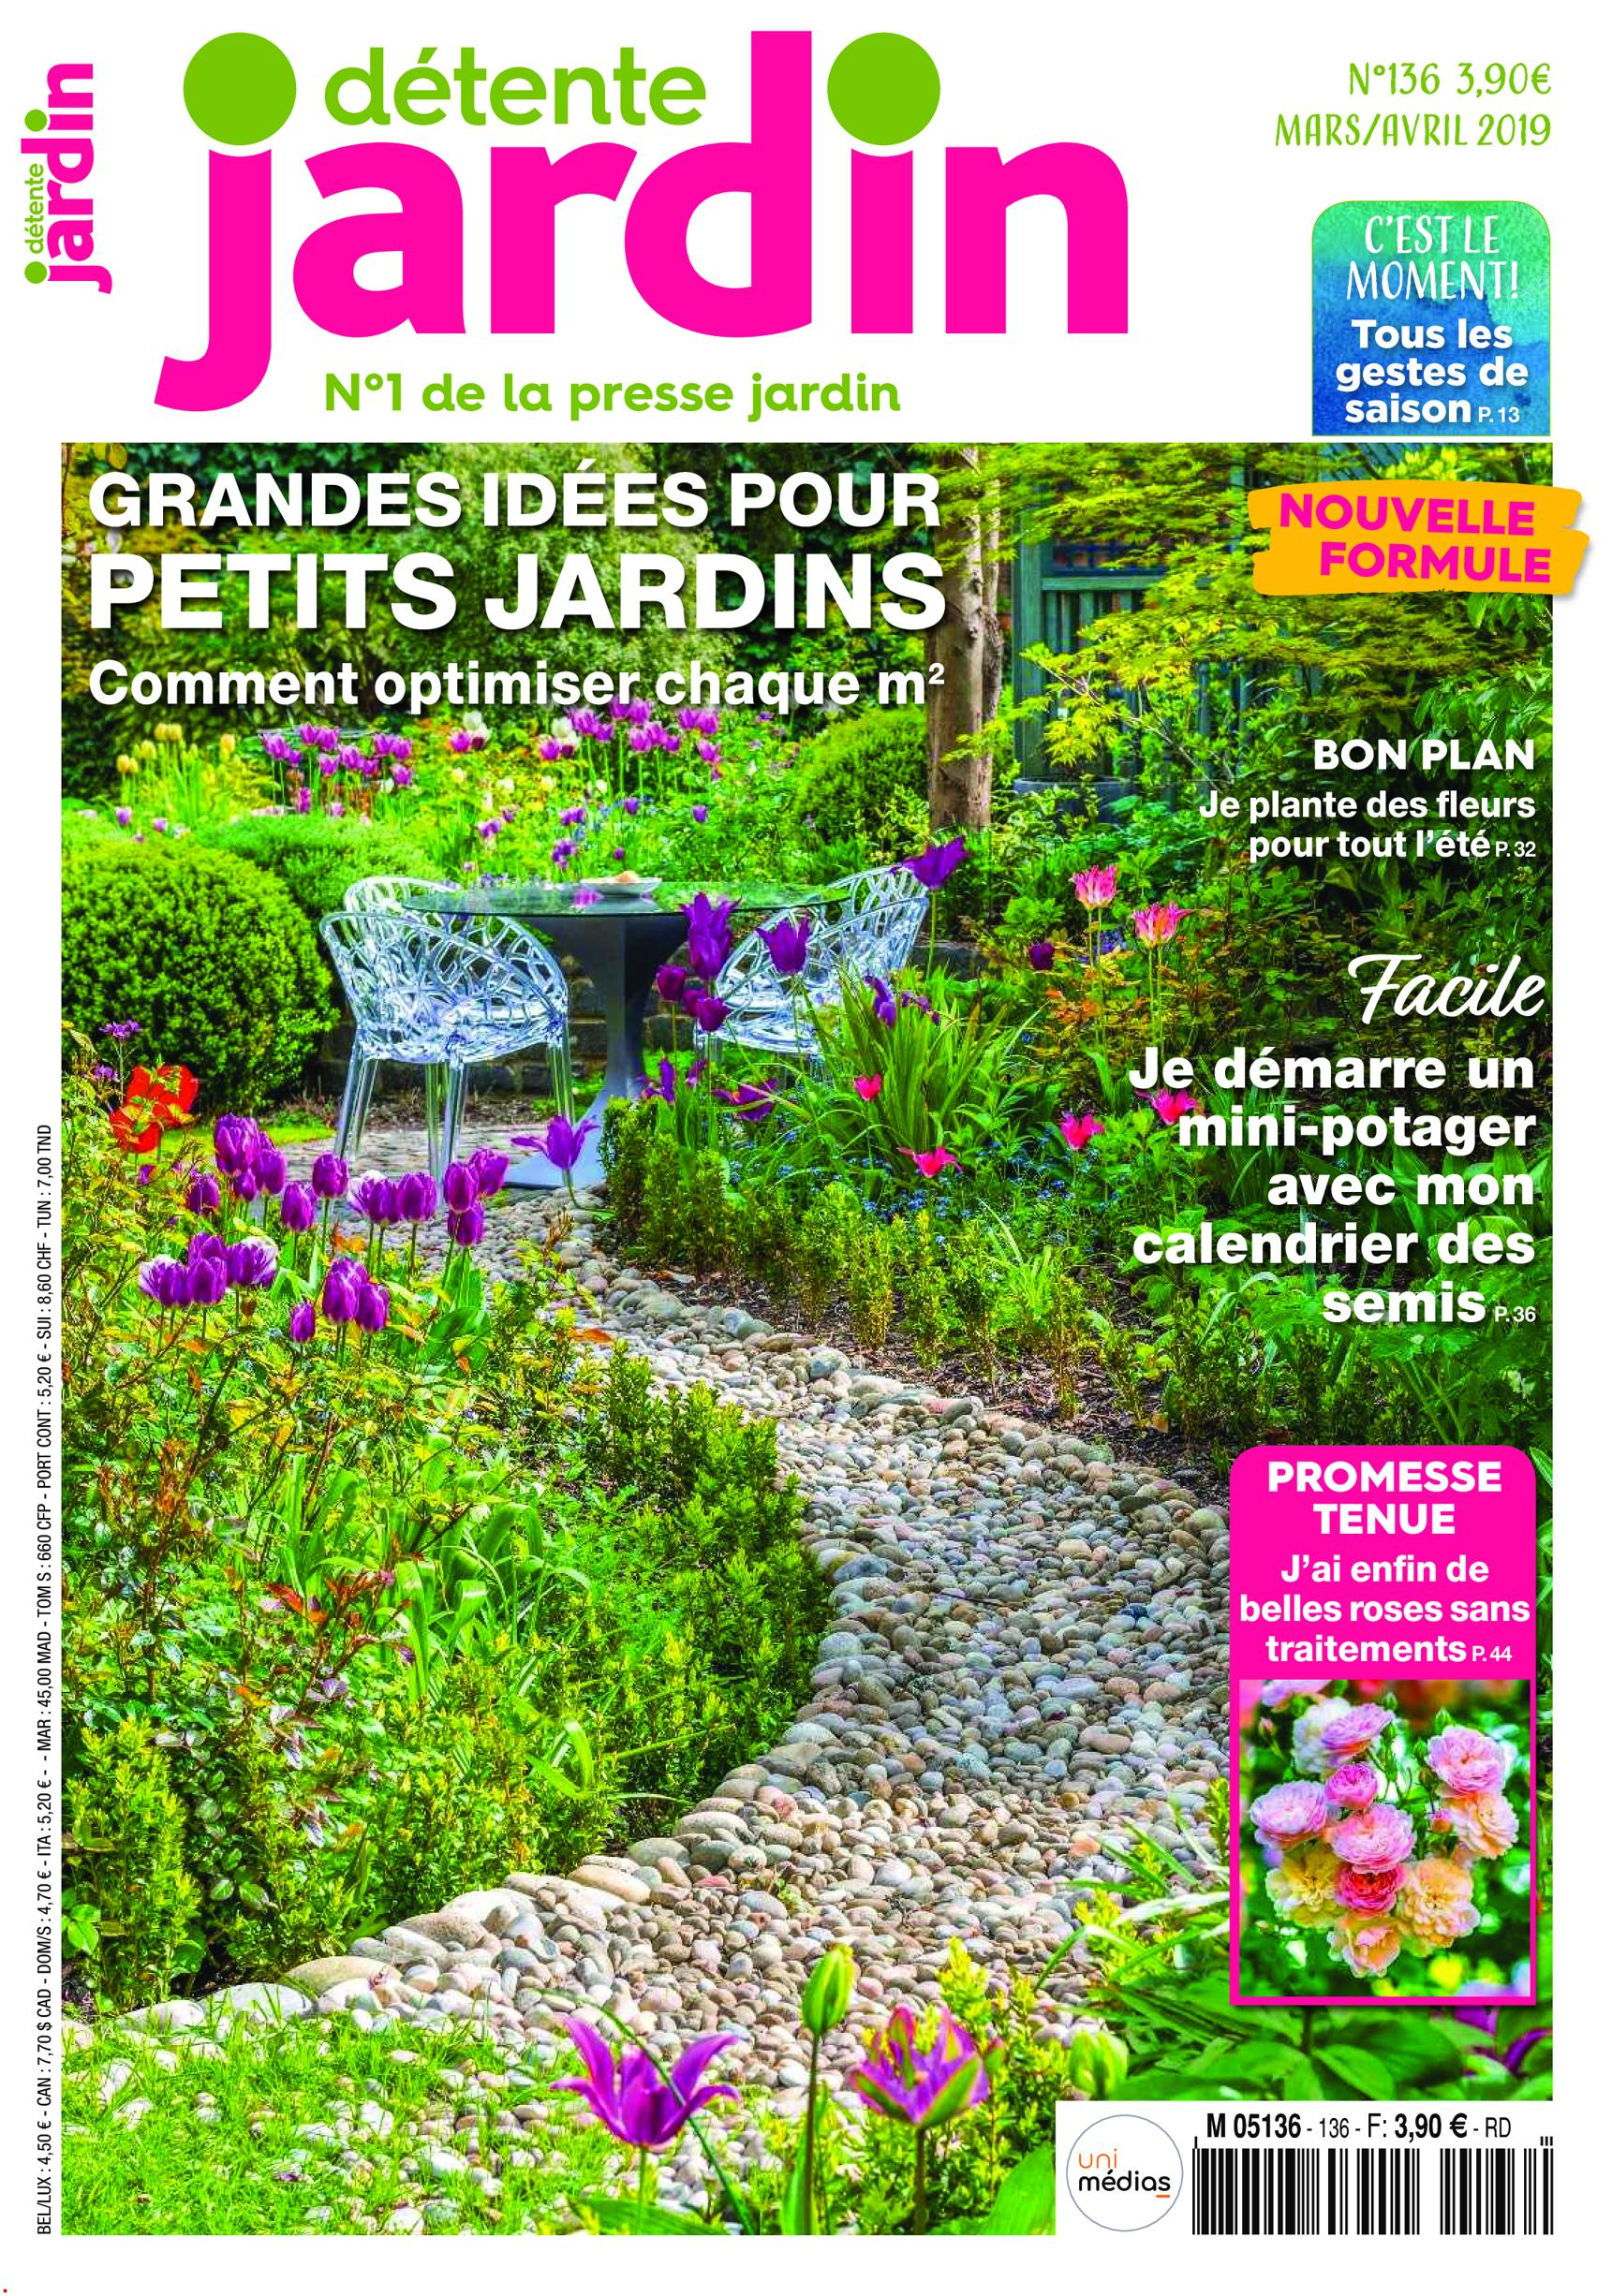 Mon Jardin En Avril détente jardin - mars/avril 2019 » free pdf magazines for